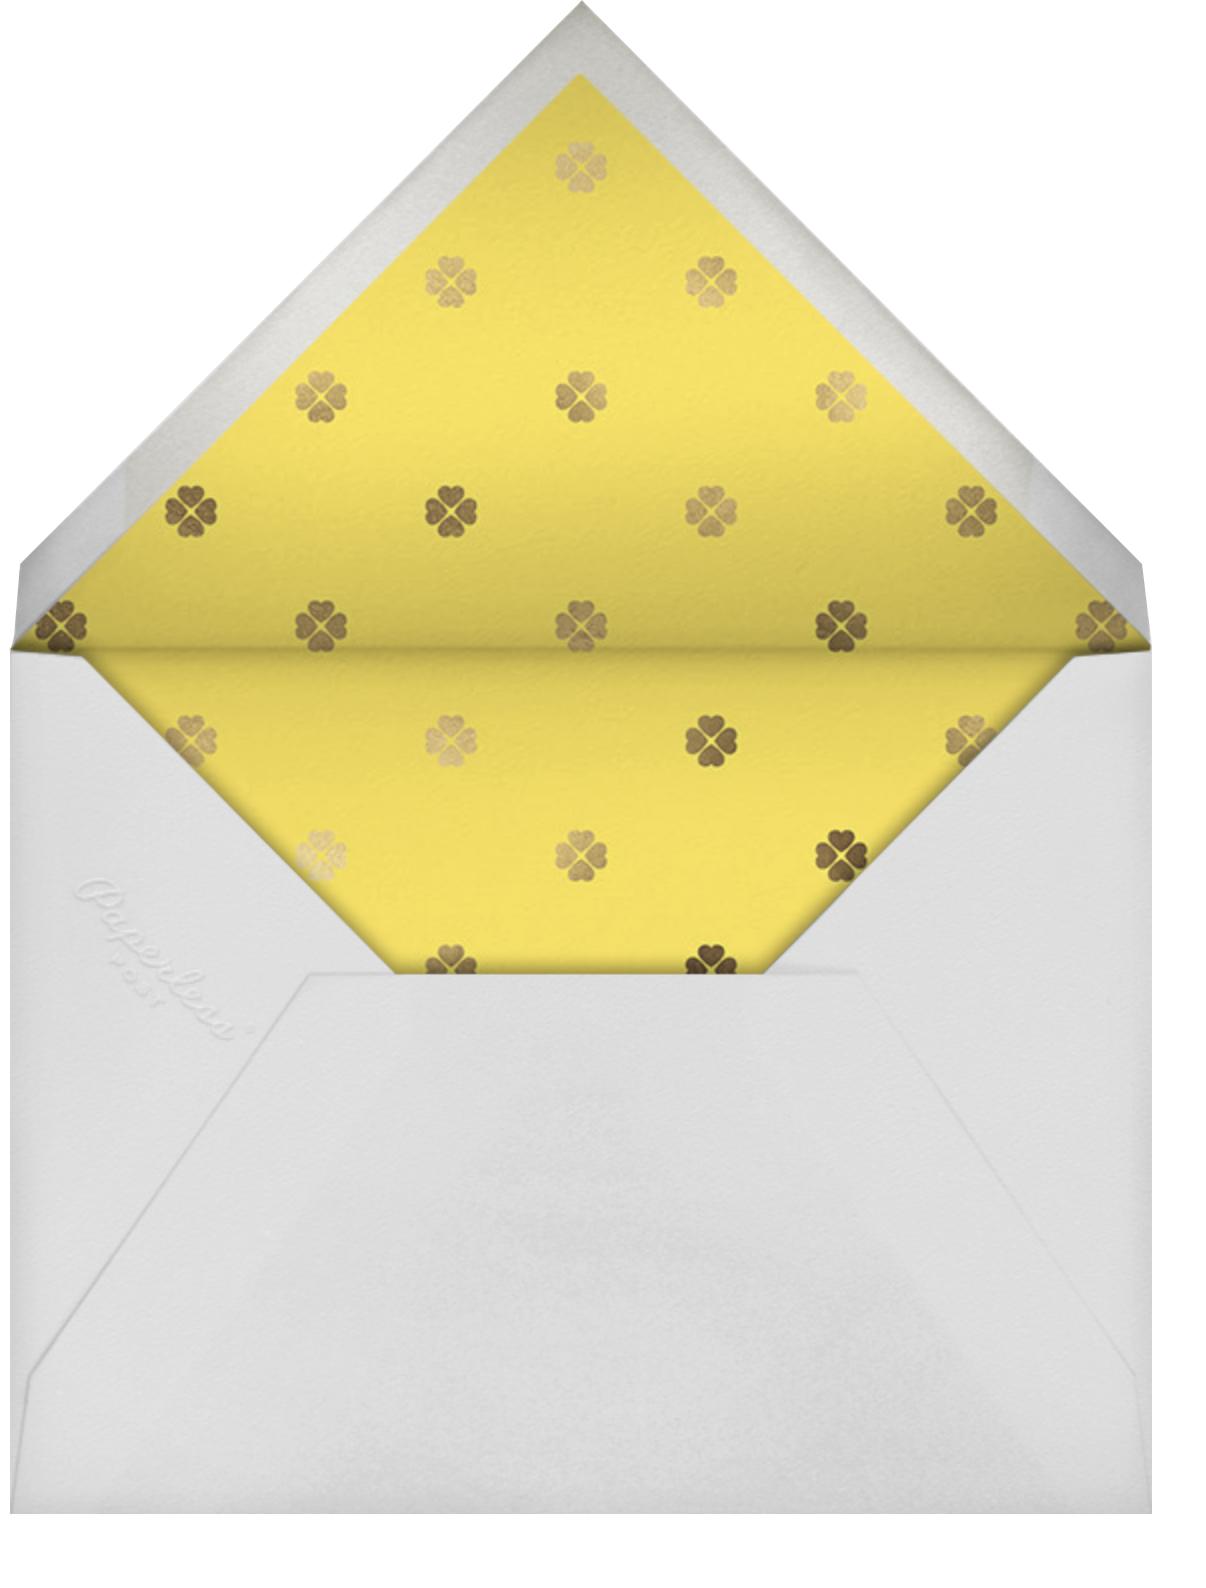 Colorblocked Stripes - Yellow/Pavlova - kate spade new york - Easter - envelope back